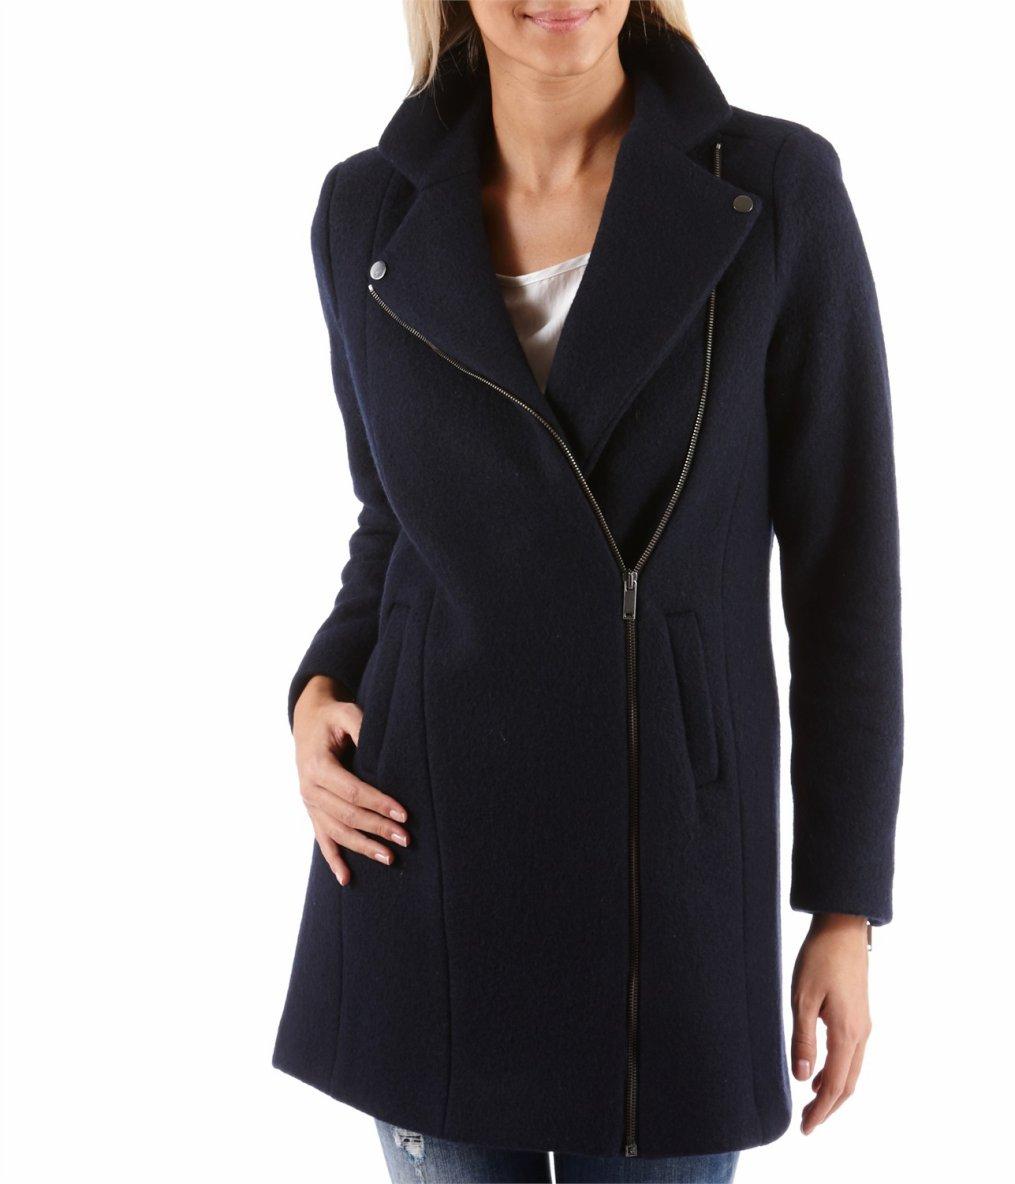 duffle coat capuche fausse fourrure lou gris perle etam tendance mode femme. Black Bedroom Furniture Sets. Home Design Ideas